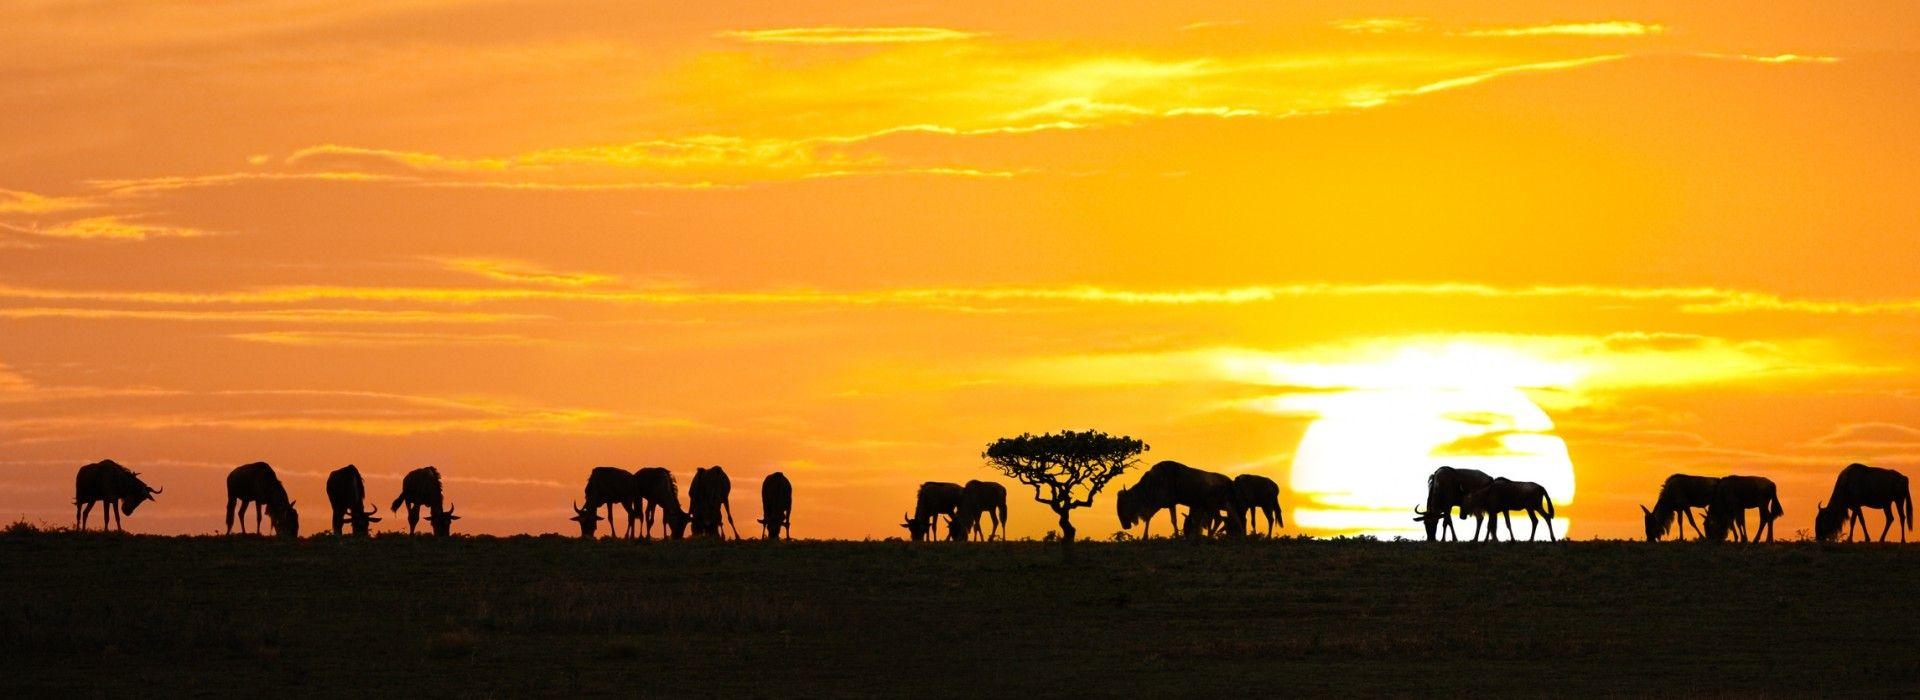 Getaways and short breaks Tours in Tanzania